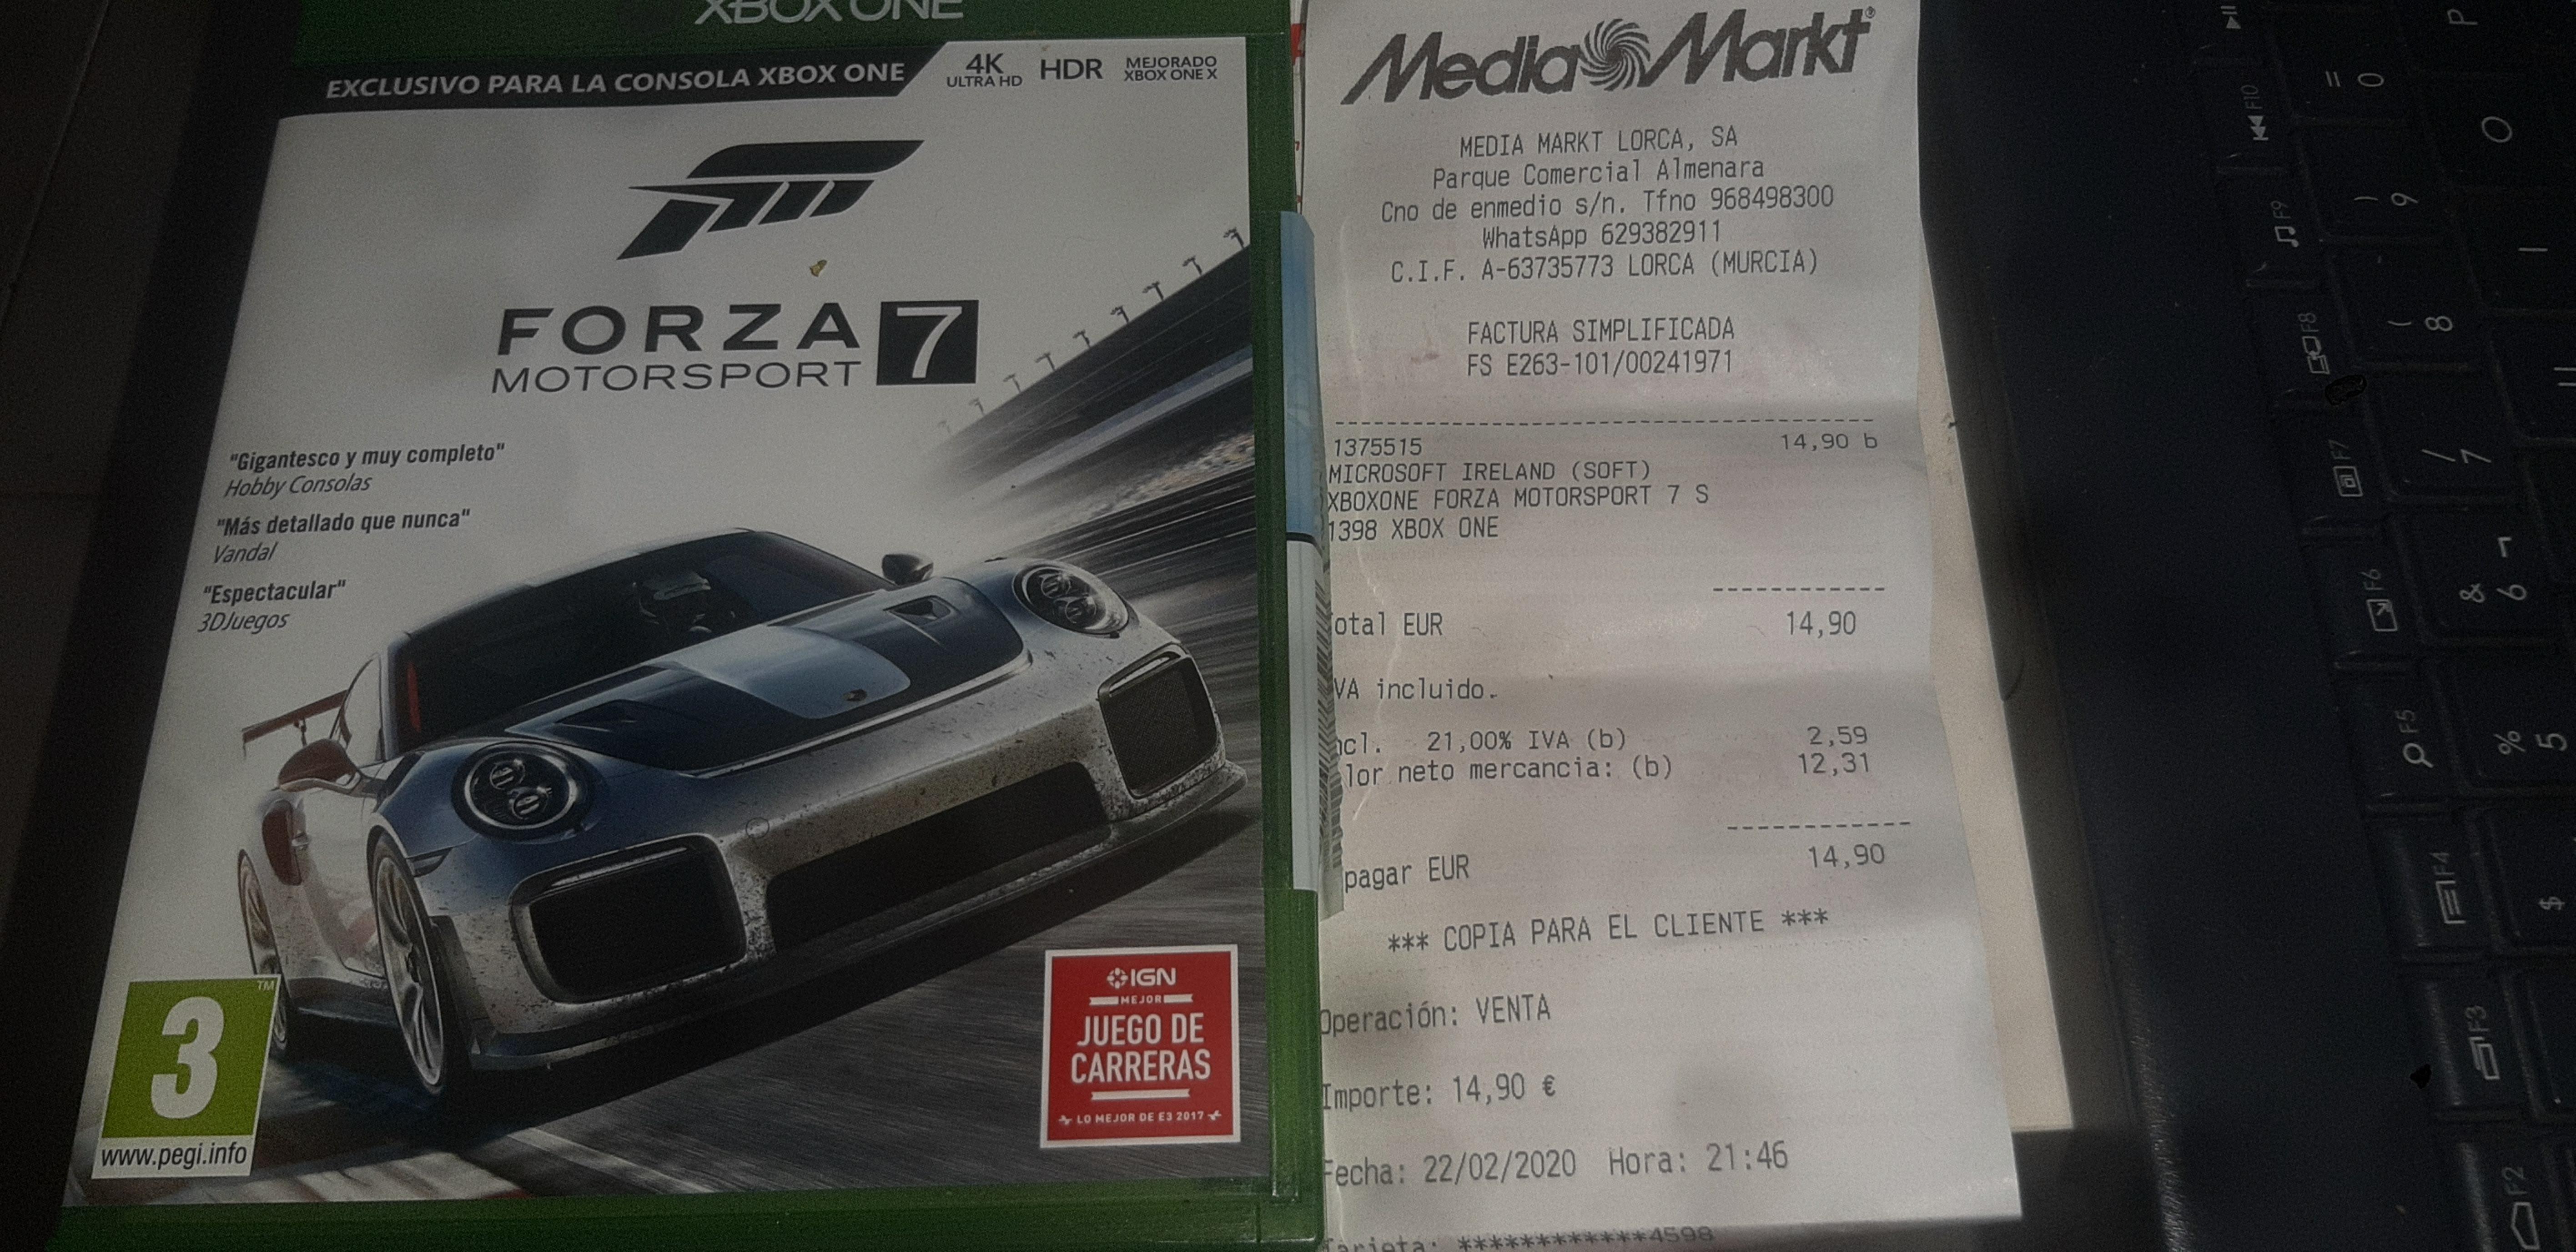 Forza Motorsport 7 Xbox One 14,90€ Mediamarkt Lorca